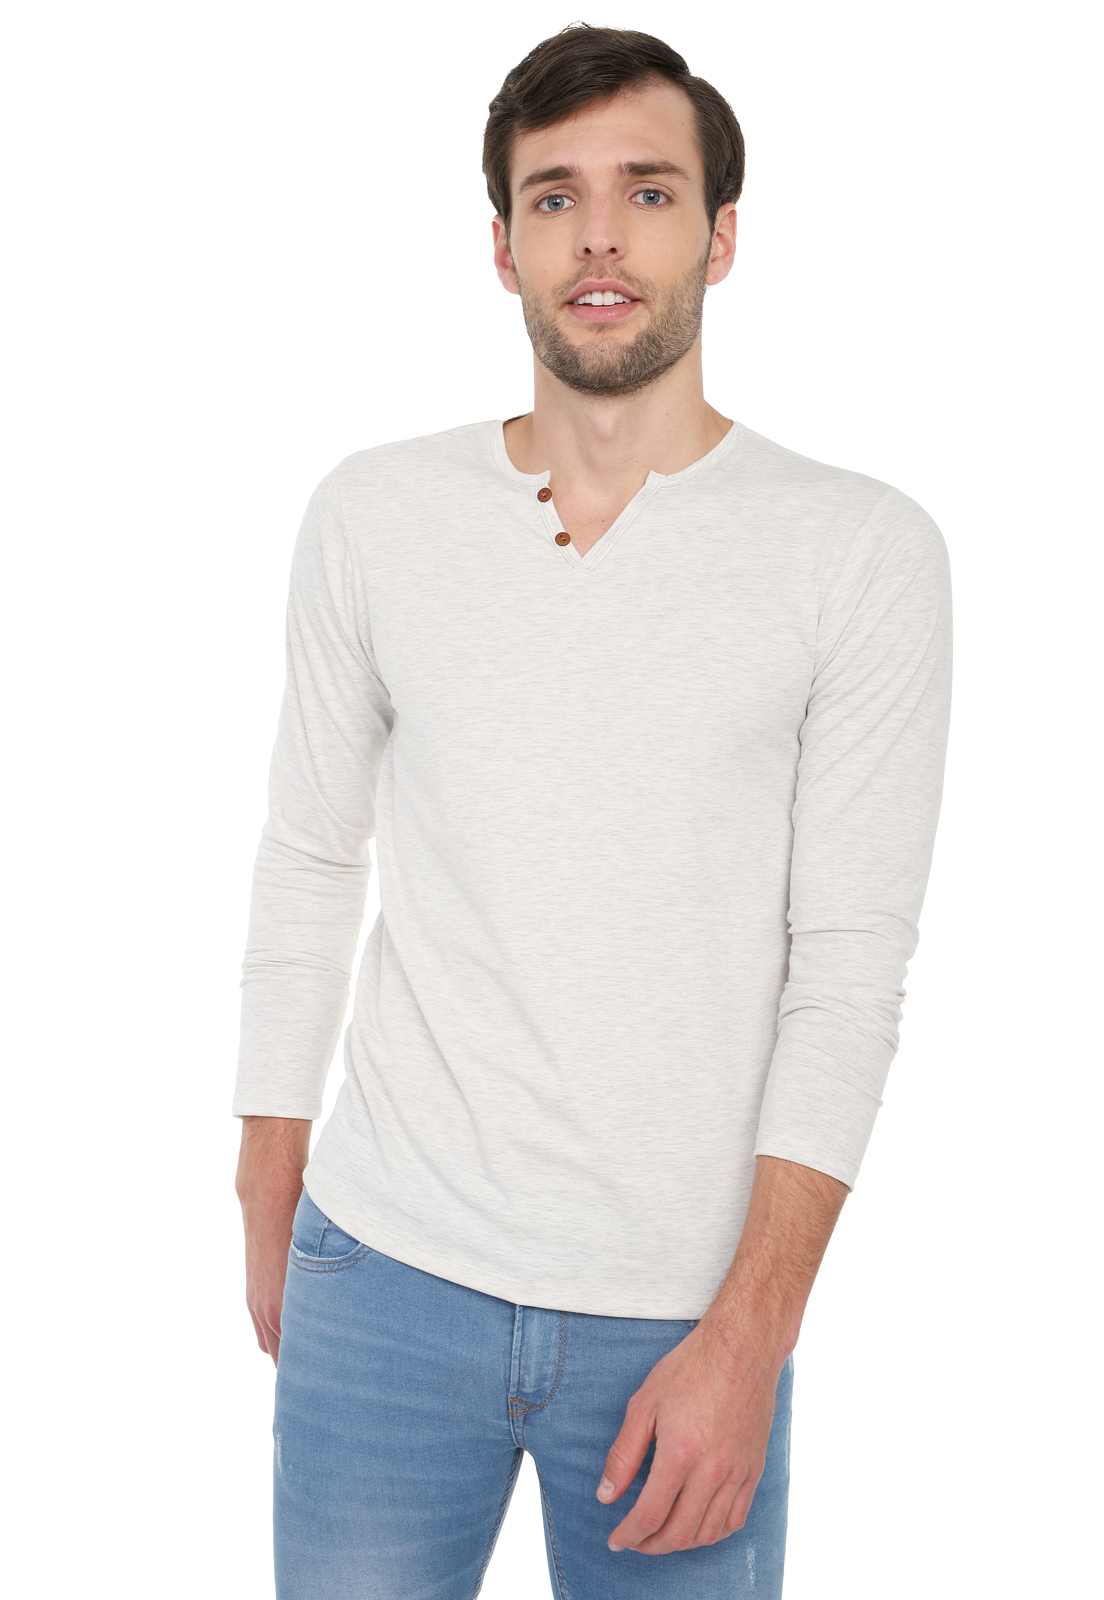 Camiseta Manga Larga Licrada - Marfil | Polovers